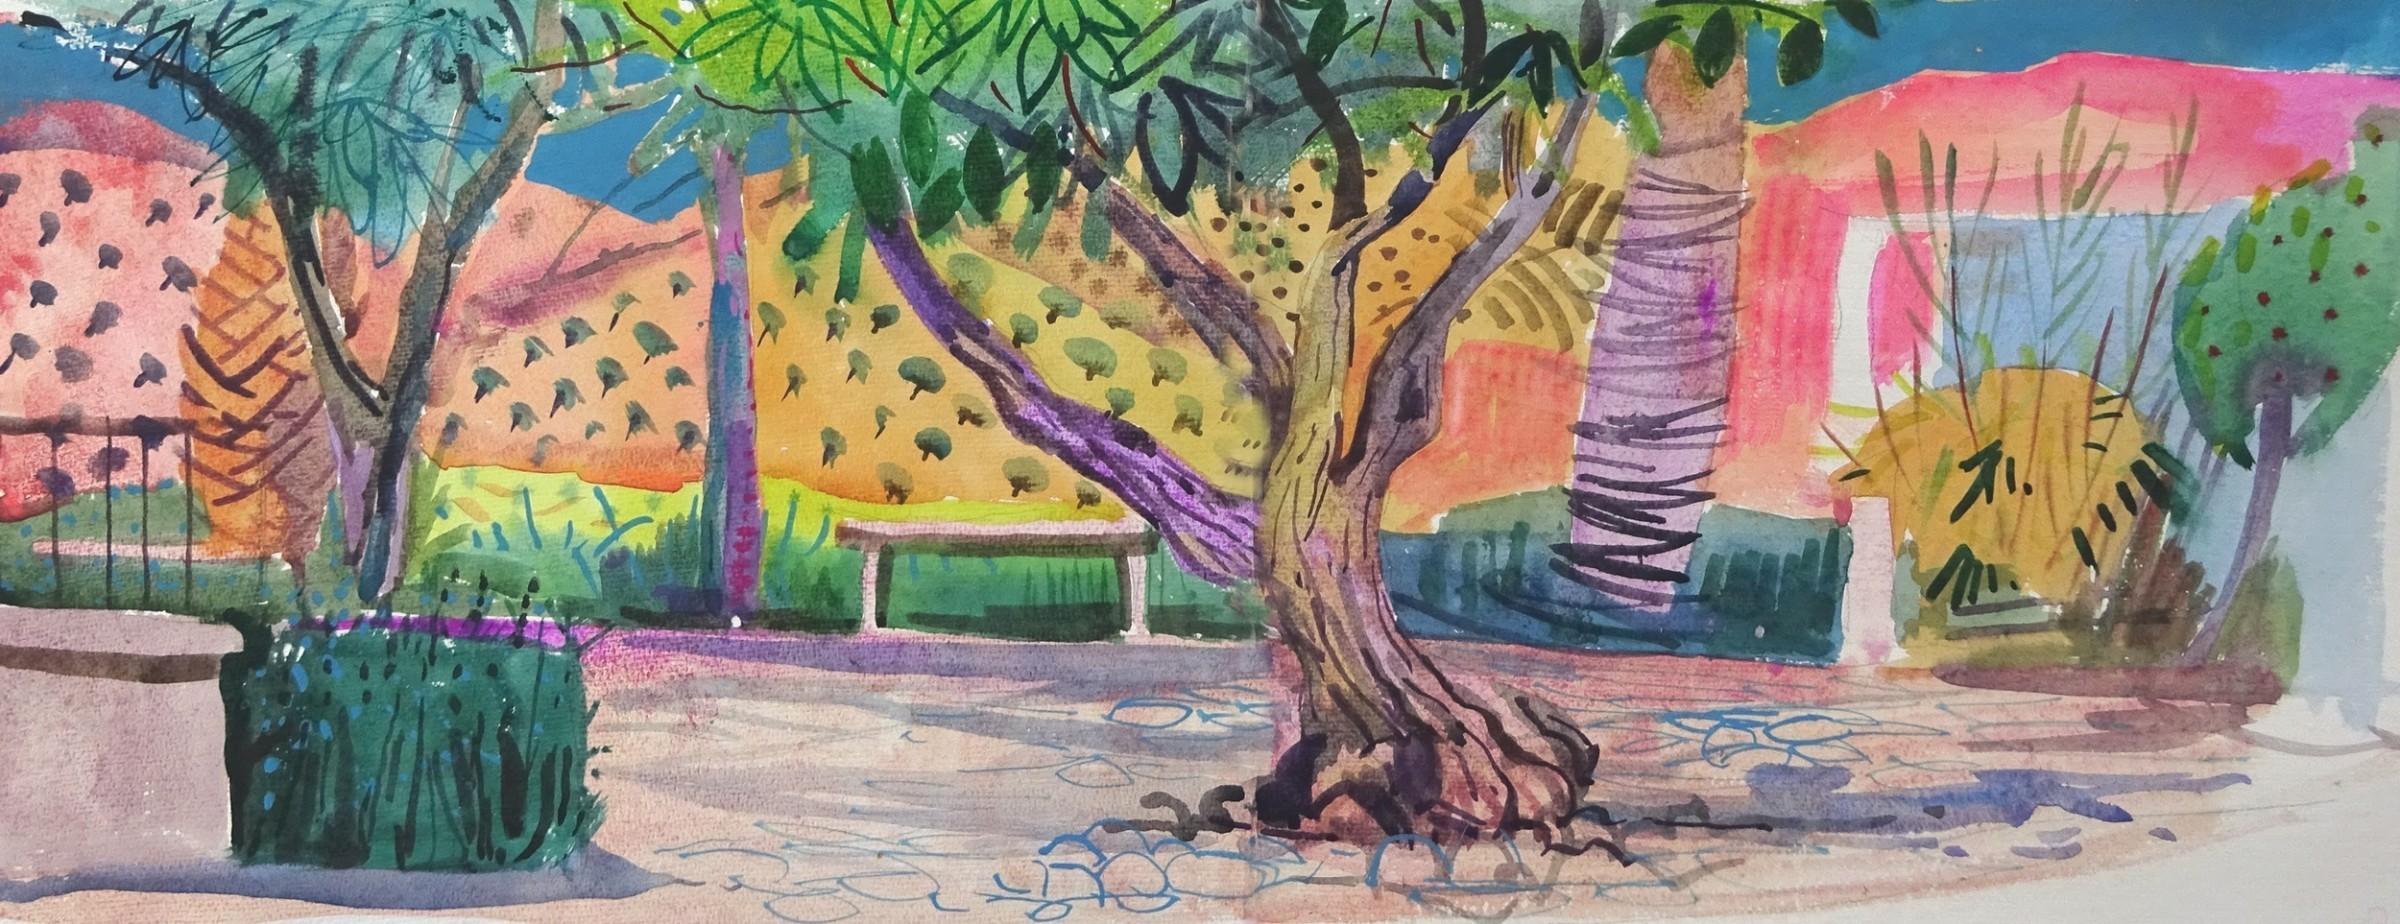 <span class=&#34;link fancybox-details-link&#34;><a href=&#34;/exhibitions/24/works/artworks_standalone10812/&#34;>View Detail Page</a></span><div class=&#34;artist&#34;><span class=&#34;artist&#34;><strong>Jenny Wheatley</strong></span></div><div class=&#34;title&#34;><em>Olive Groves from the Park</em></div><div class=&#34;medium&#34;>watercolour</div><div class=&#34;dimensions&#34;>49x85cm</div>